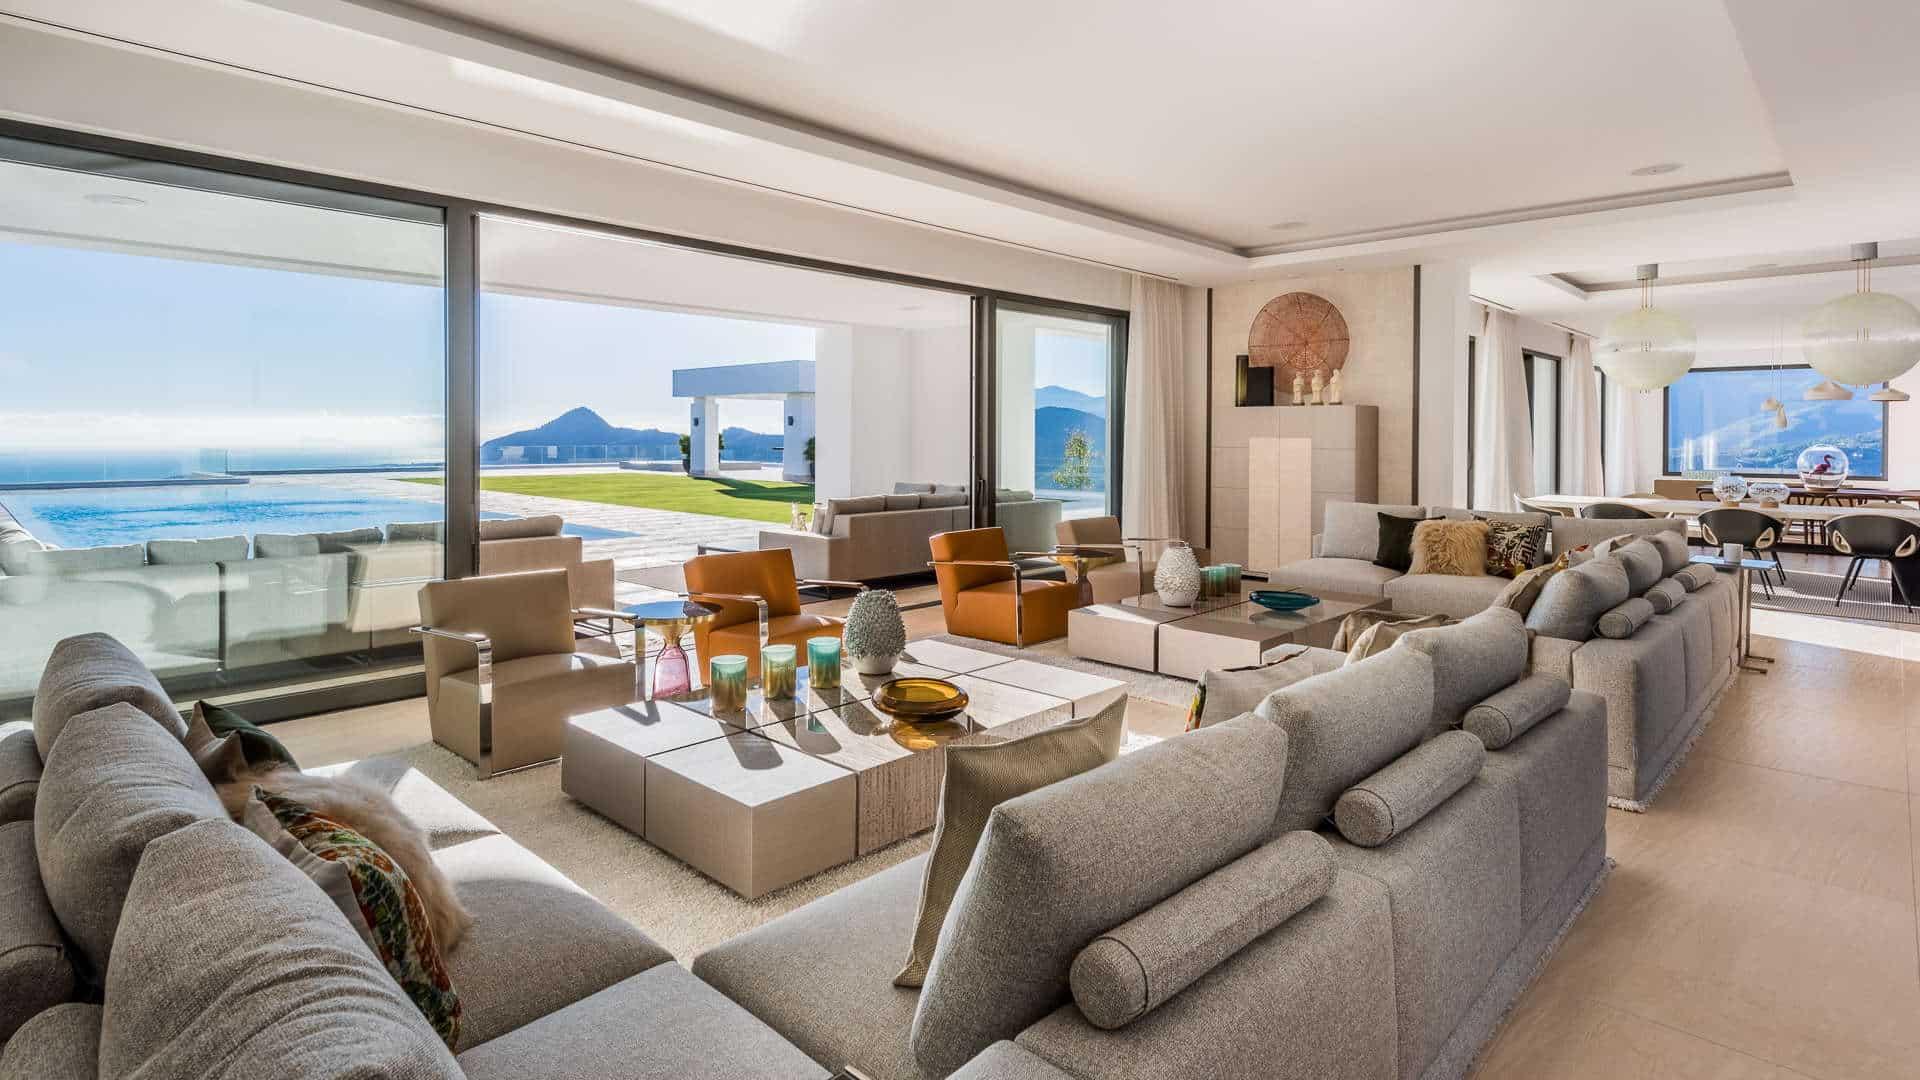 The most exclusive new modern villa for sale with breathtaking views in La Zagaleta, Benahavís